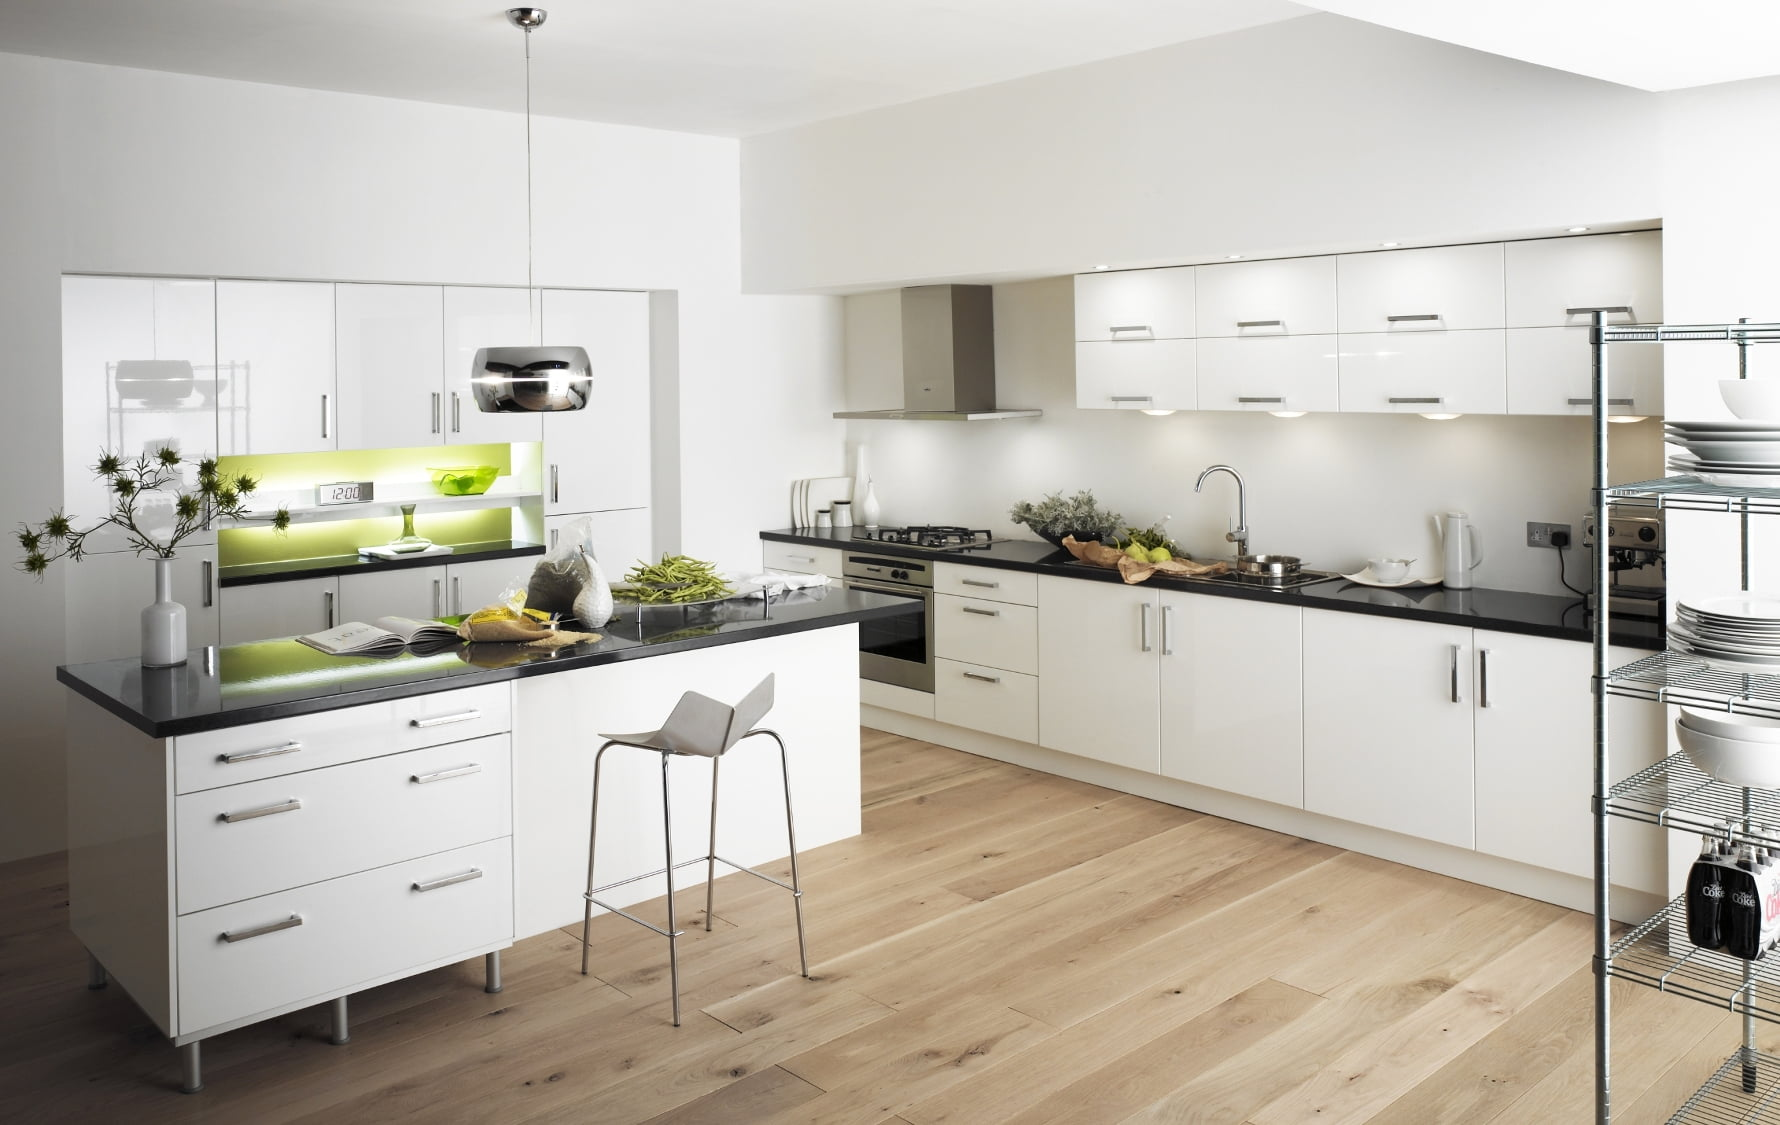 Дизайн кухни классики